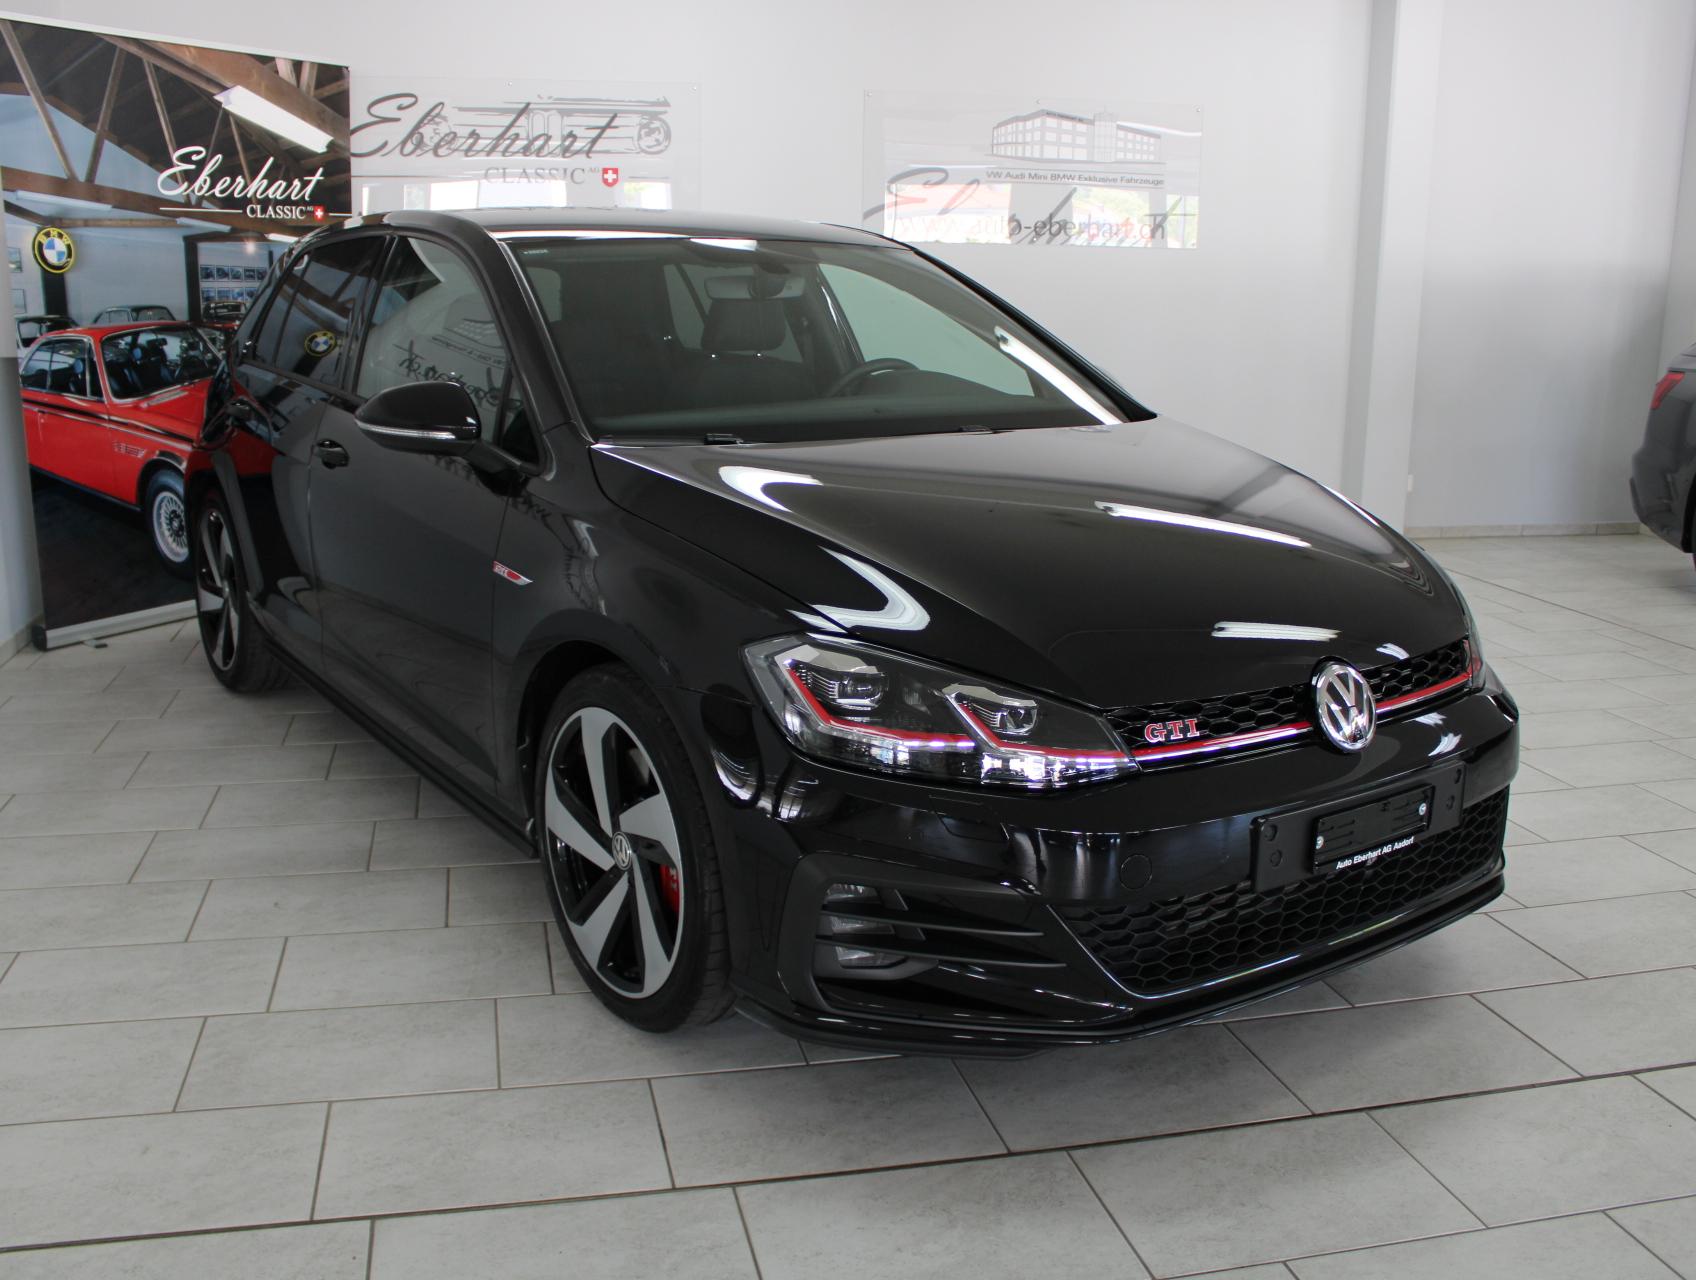 saloon VW Golf 2.0 TSI GTI Performance